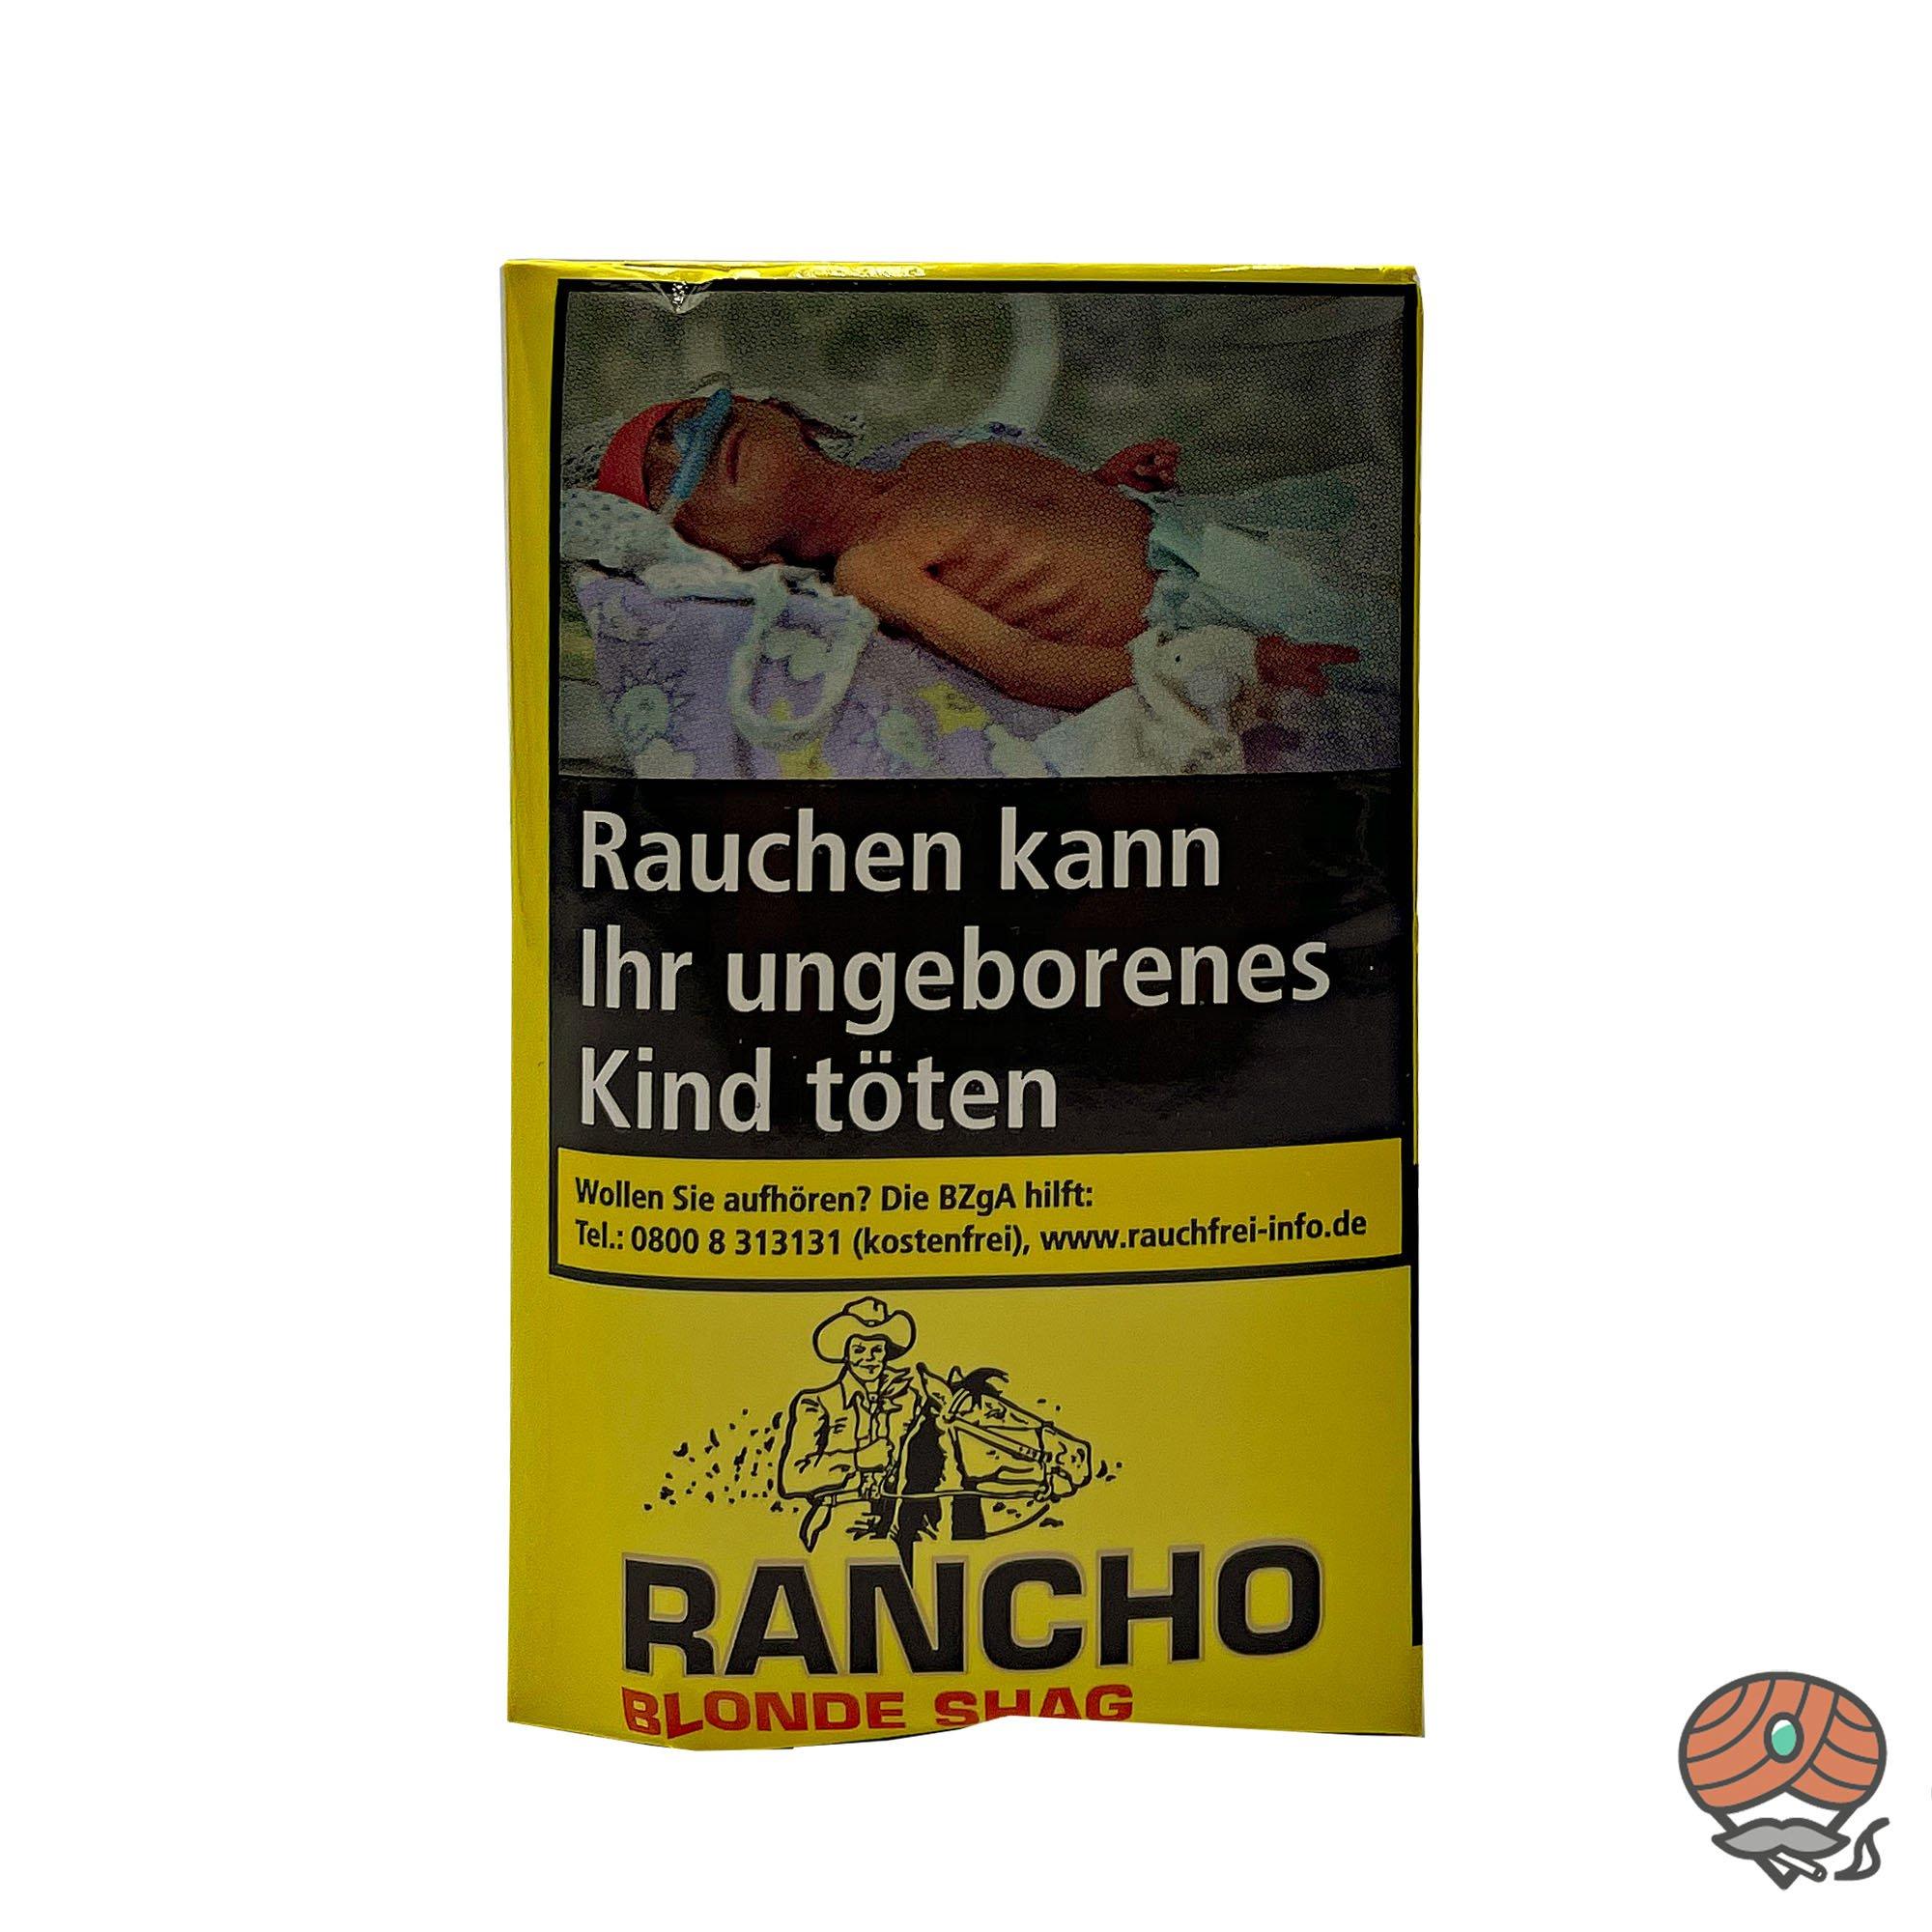 Rancho Blonde Shag Zigarettentabak 40g Beutel / Pouch